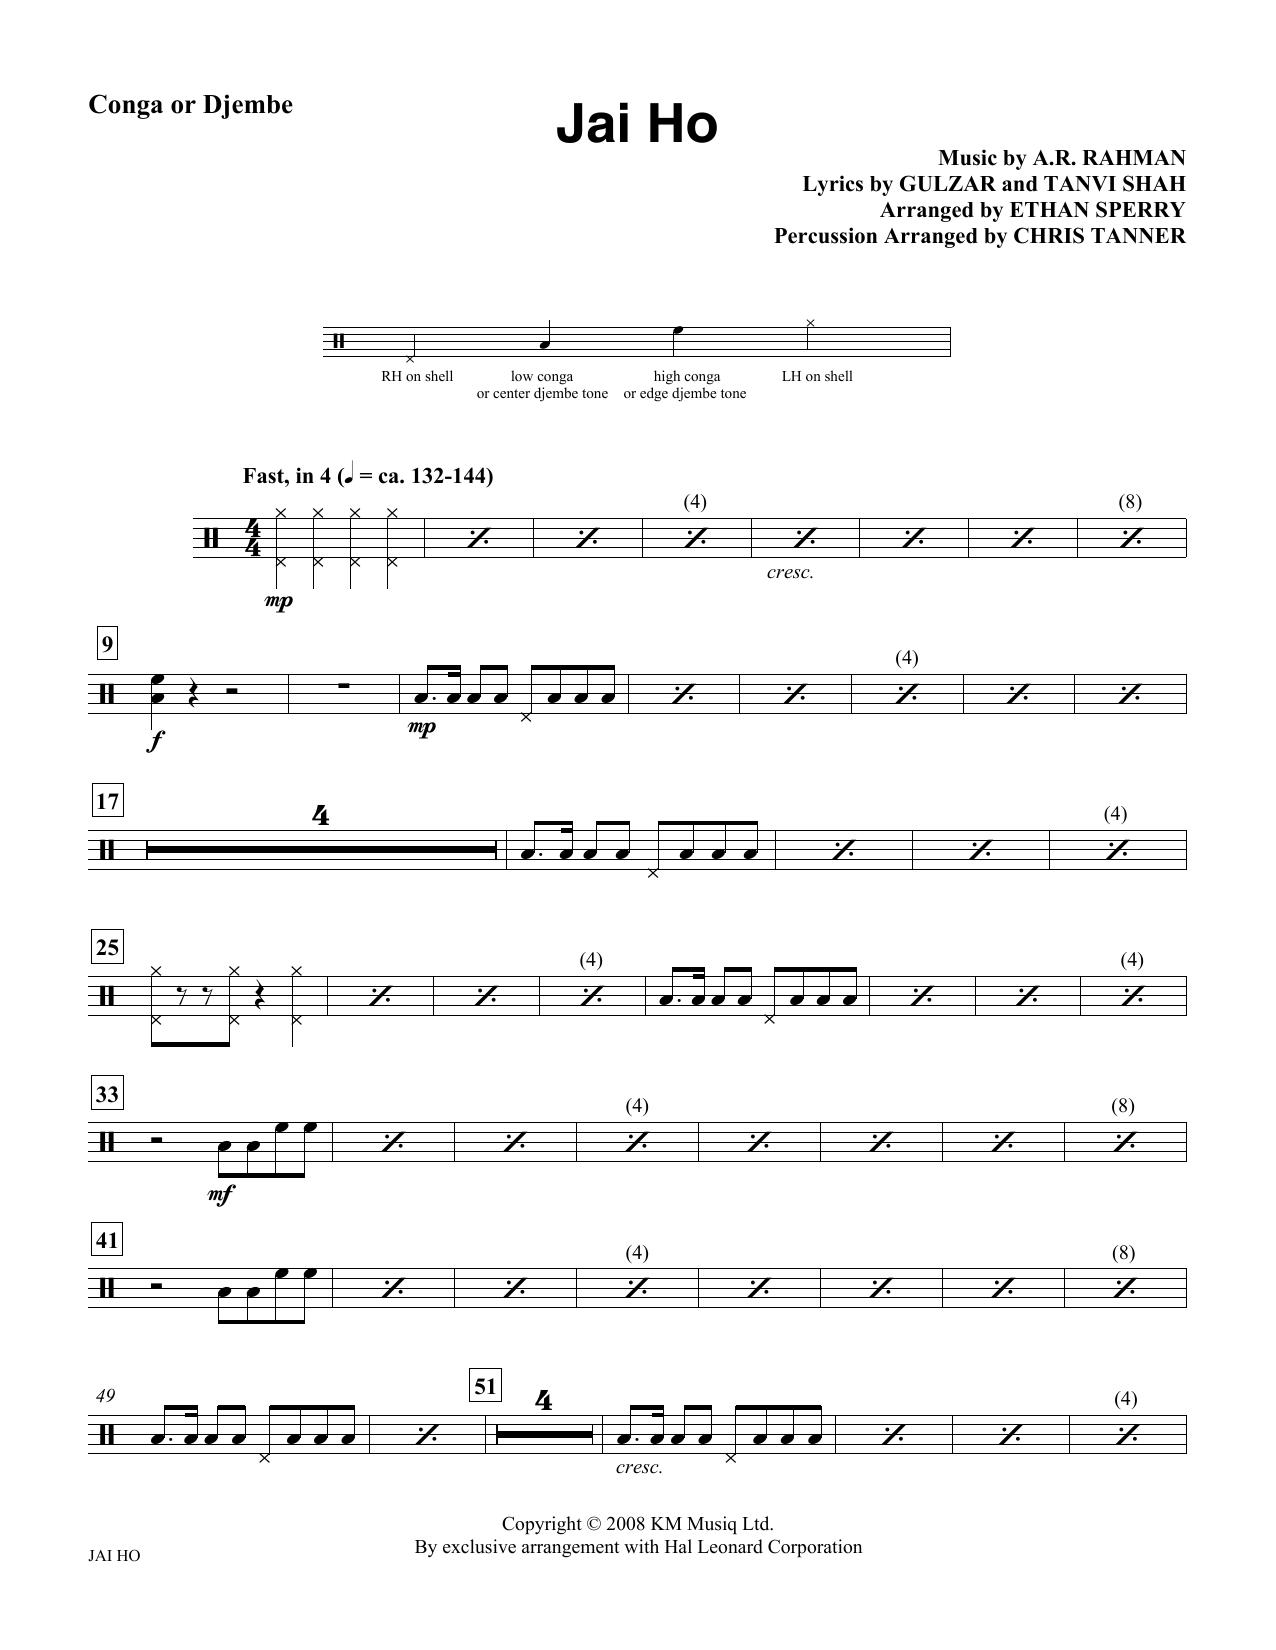 Jai Ho - Congas Sheet Music